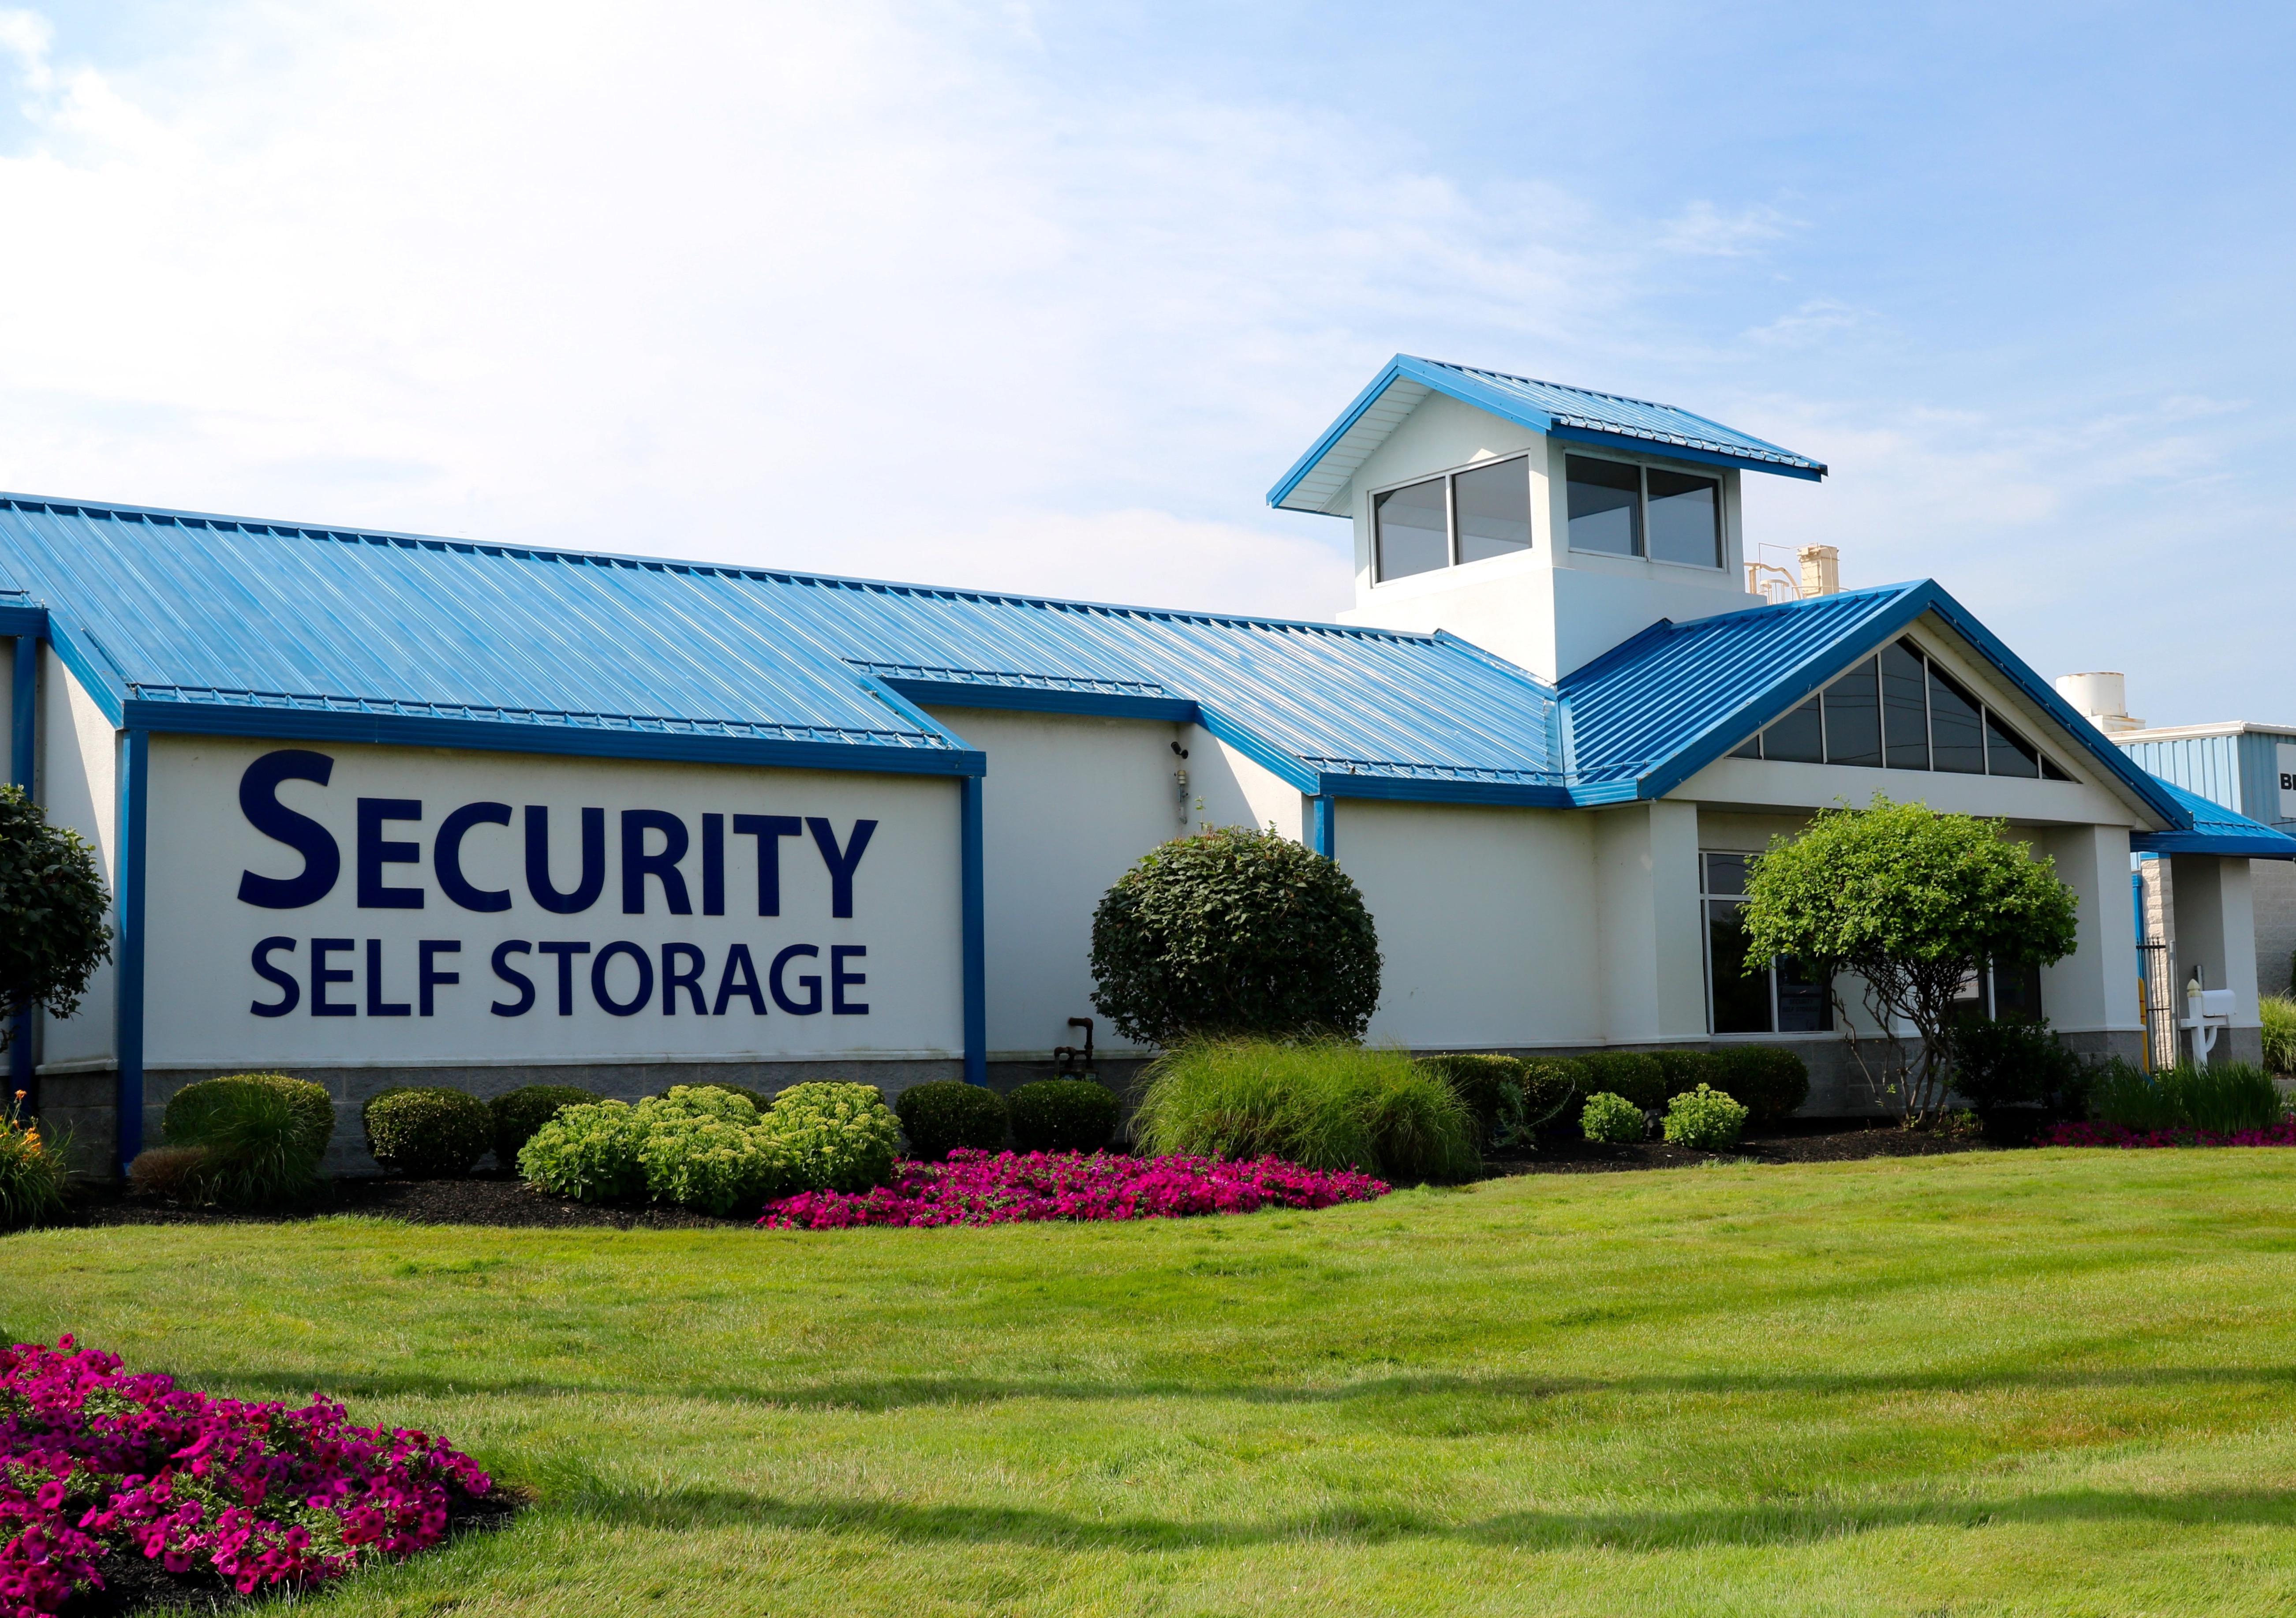 Security Self Storage image 1